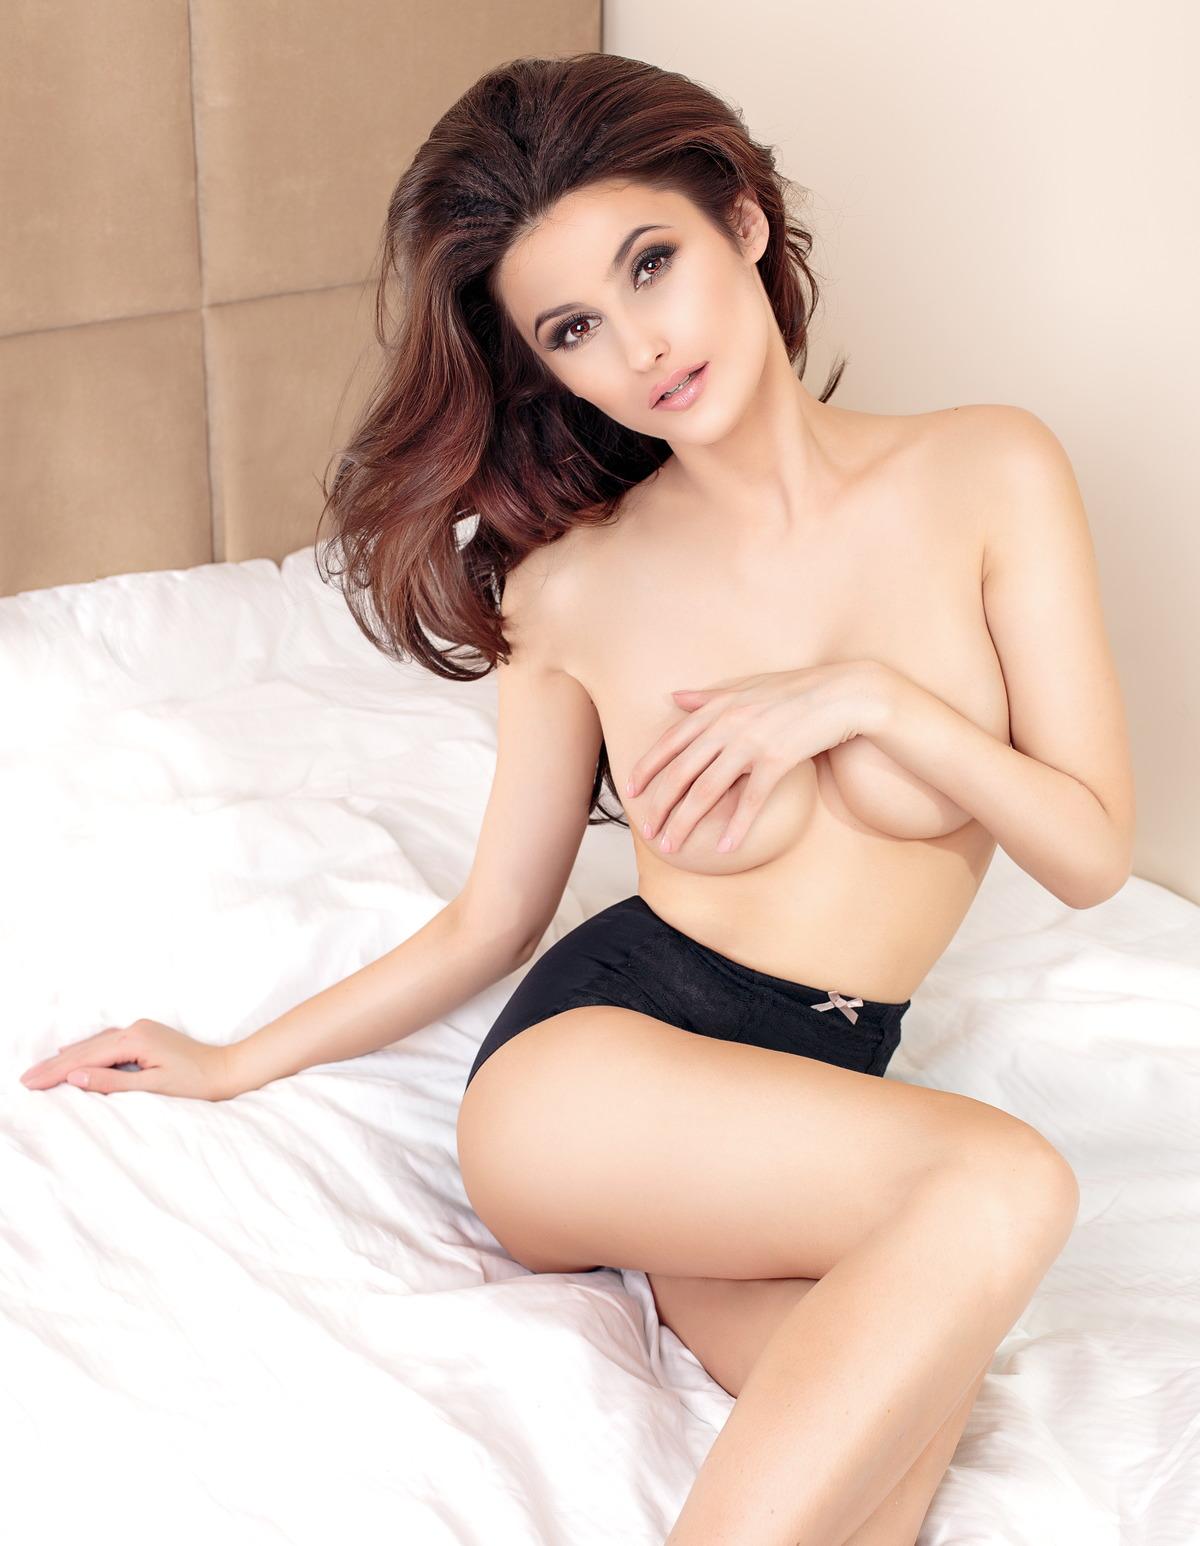 Sexy Girl im Hotebett